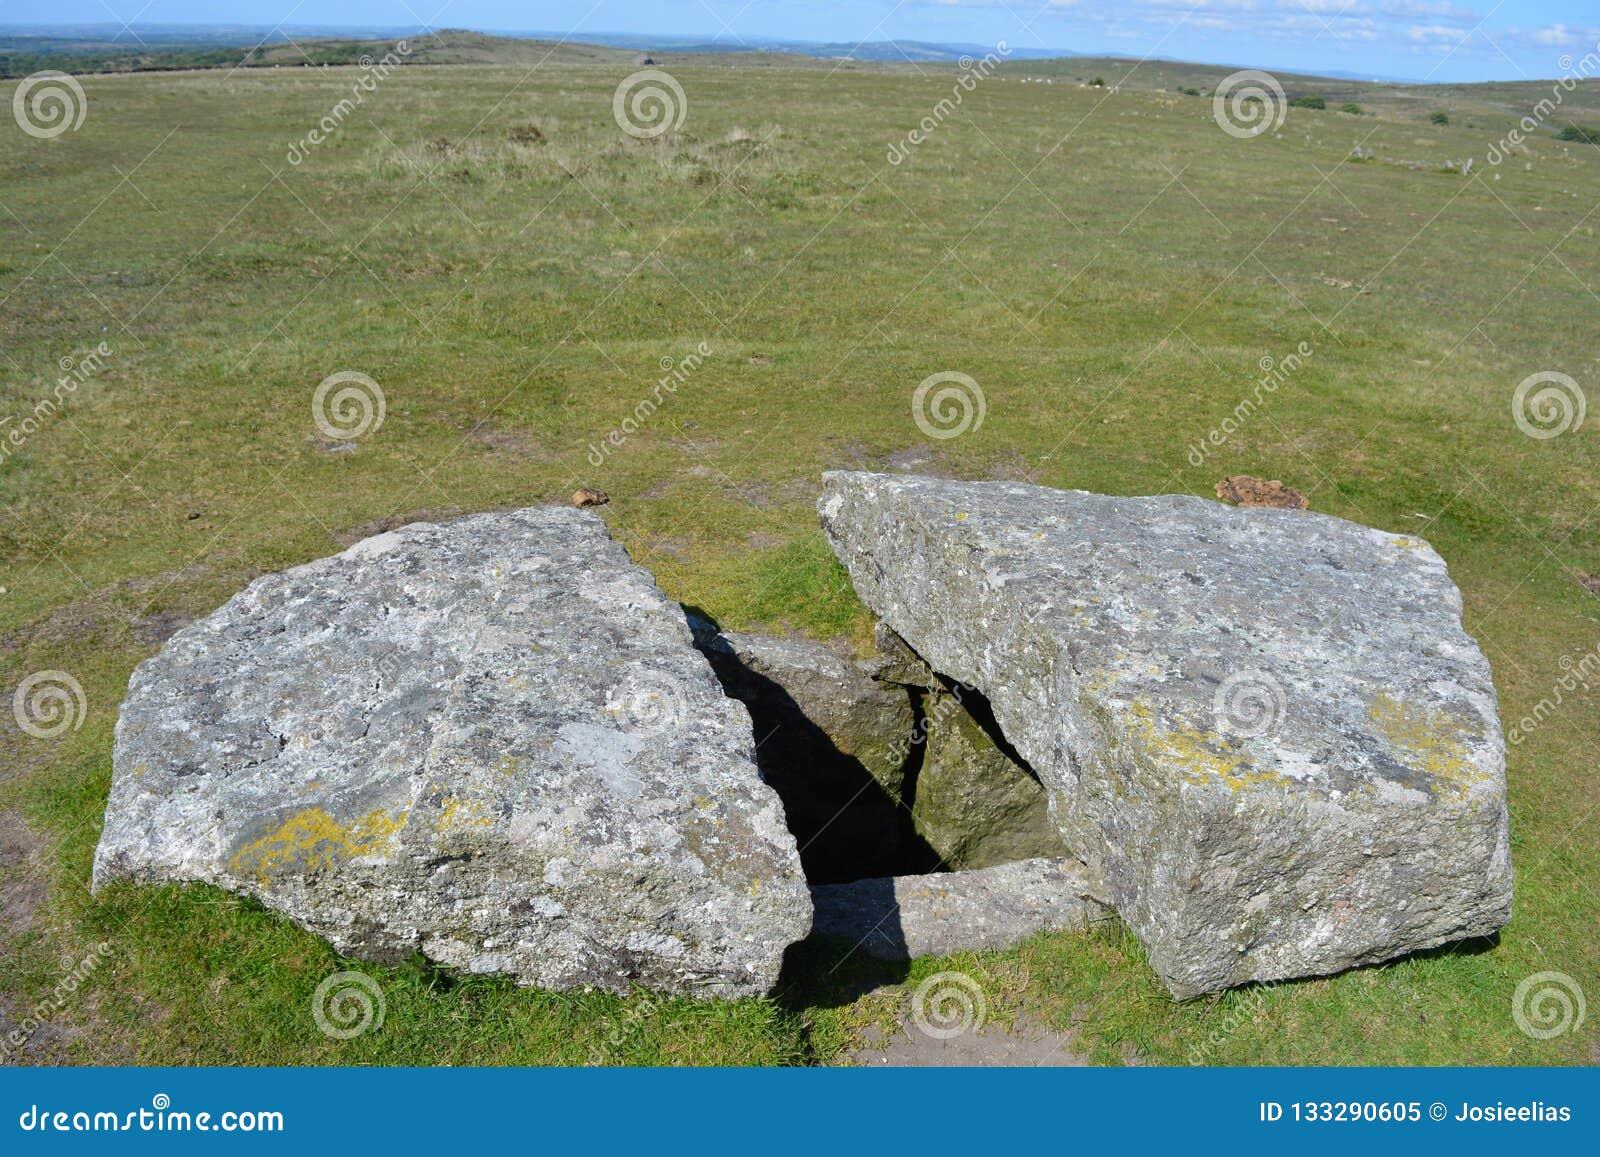 Prehistoric burial chamber, Dartmoor National Park, Devon,